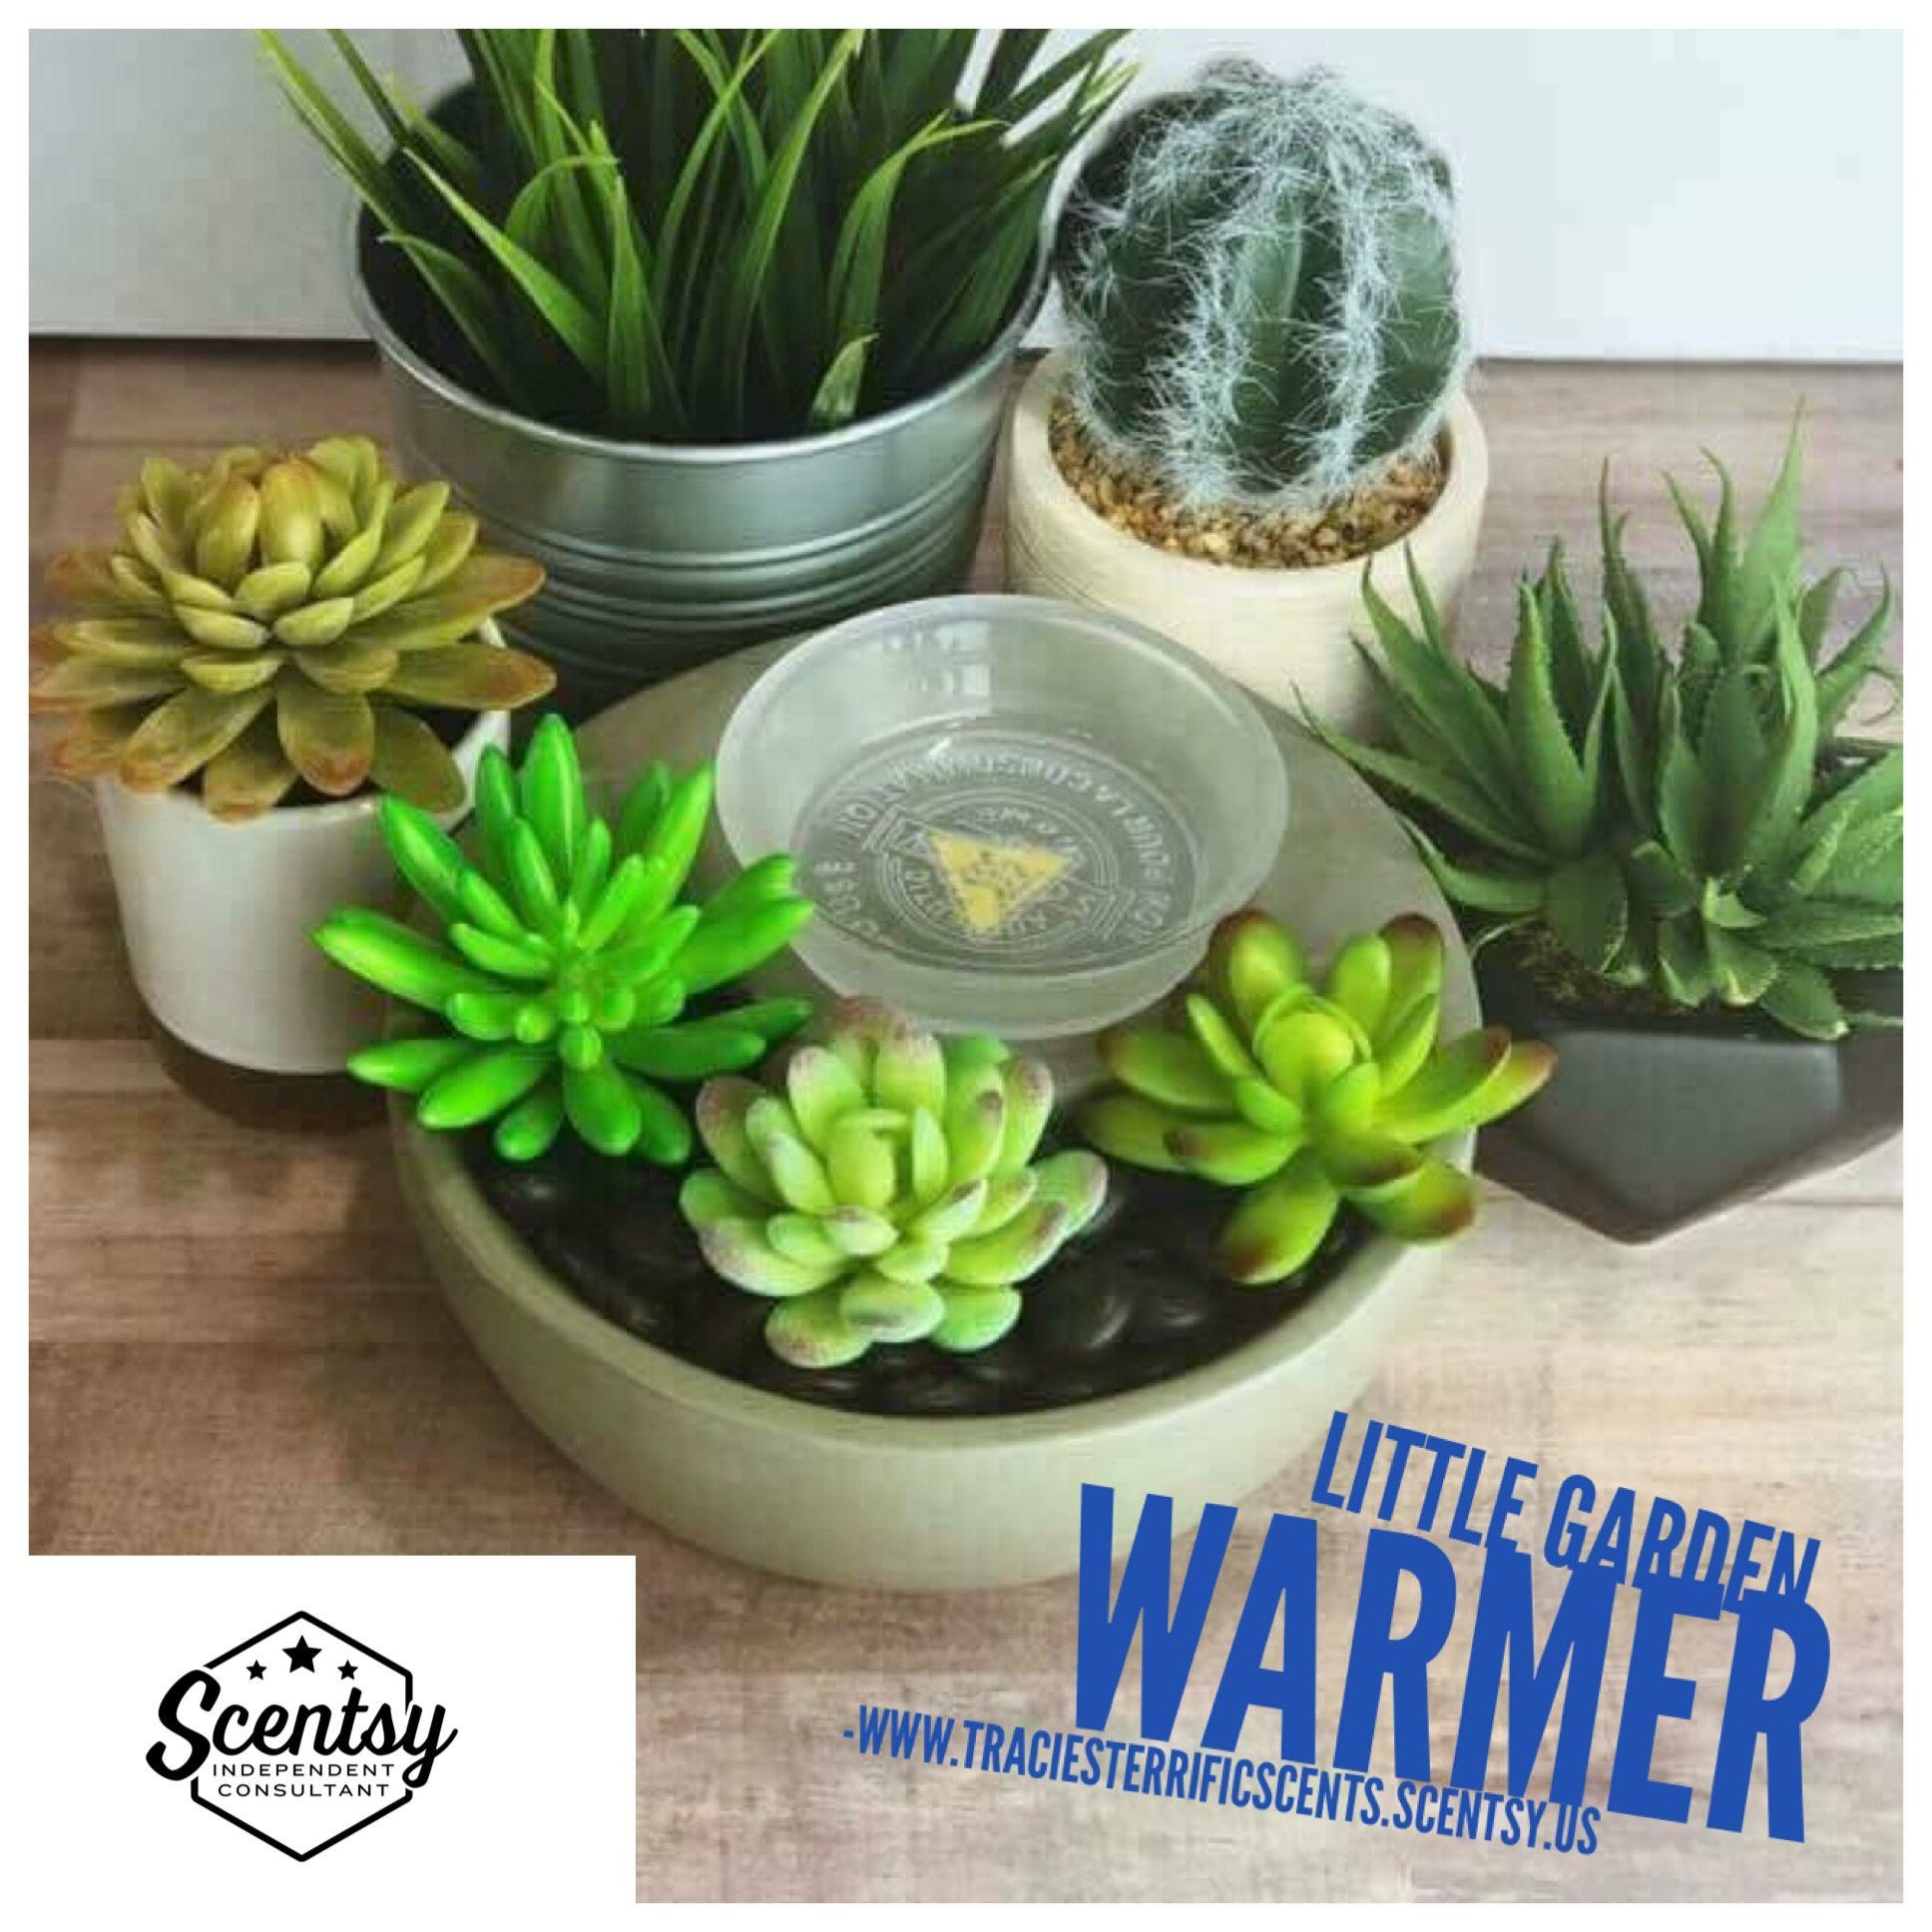 Little Garden Warmer Scentsy Pinterest Scentsy